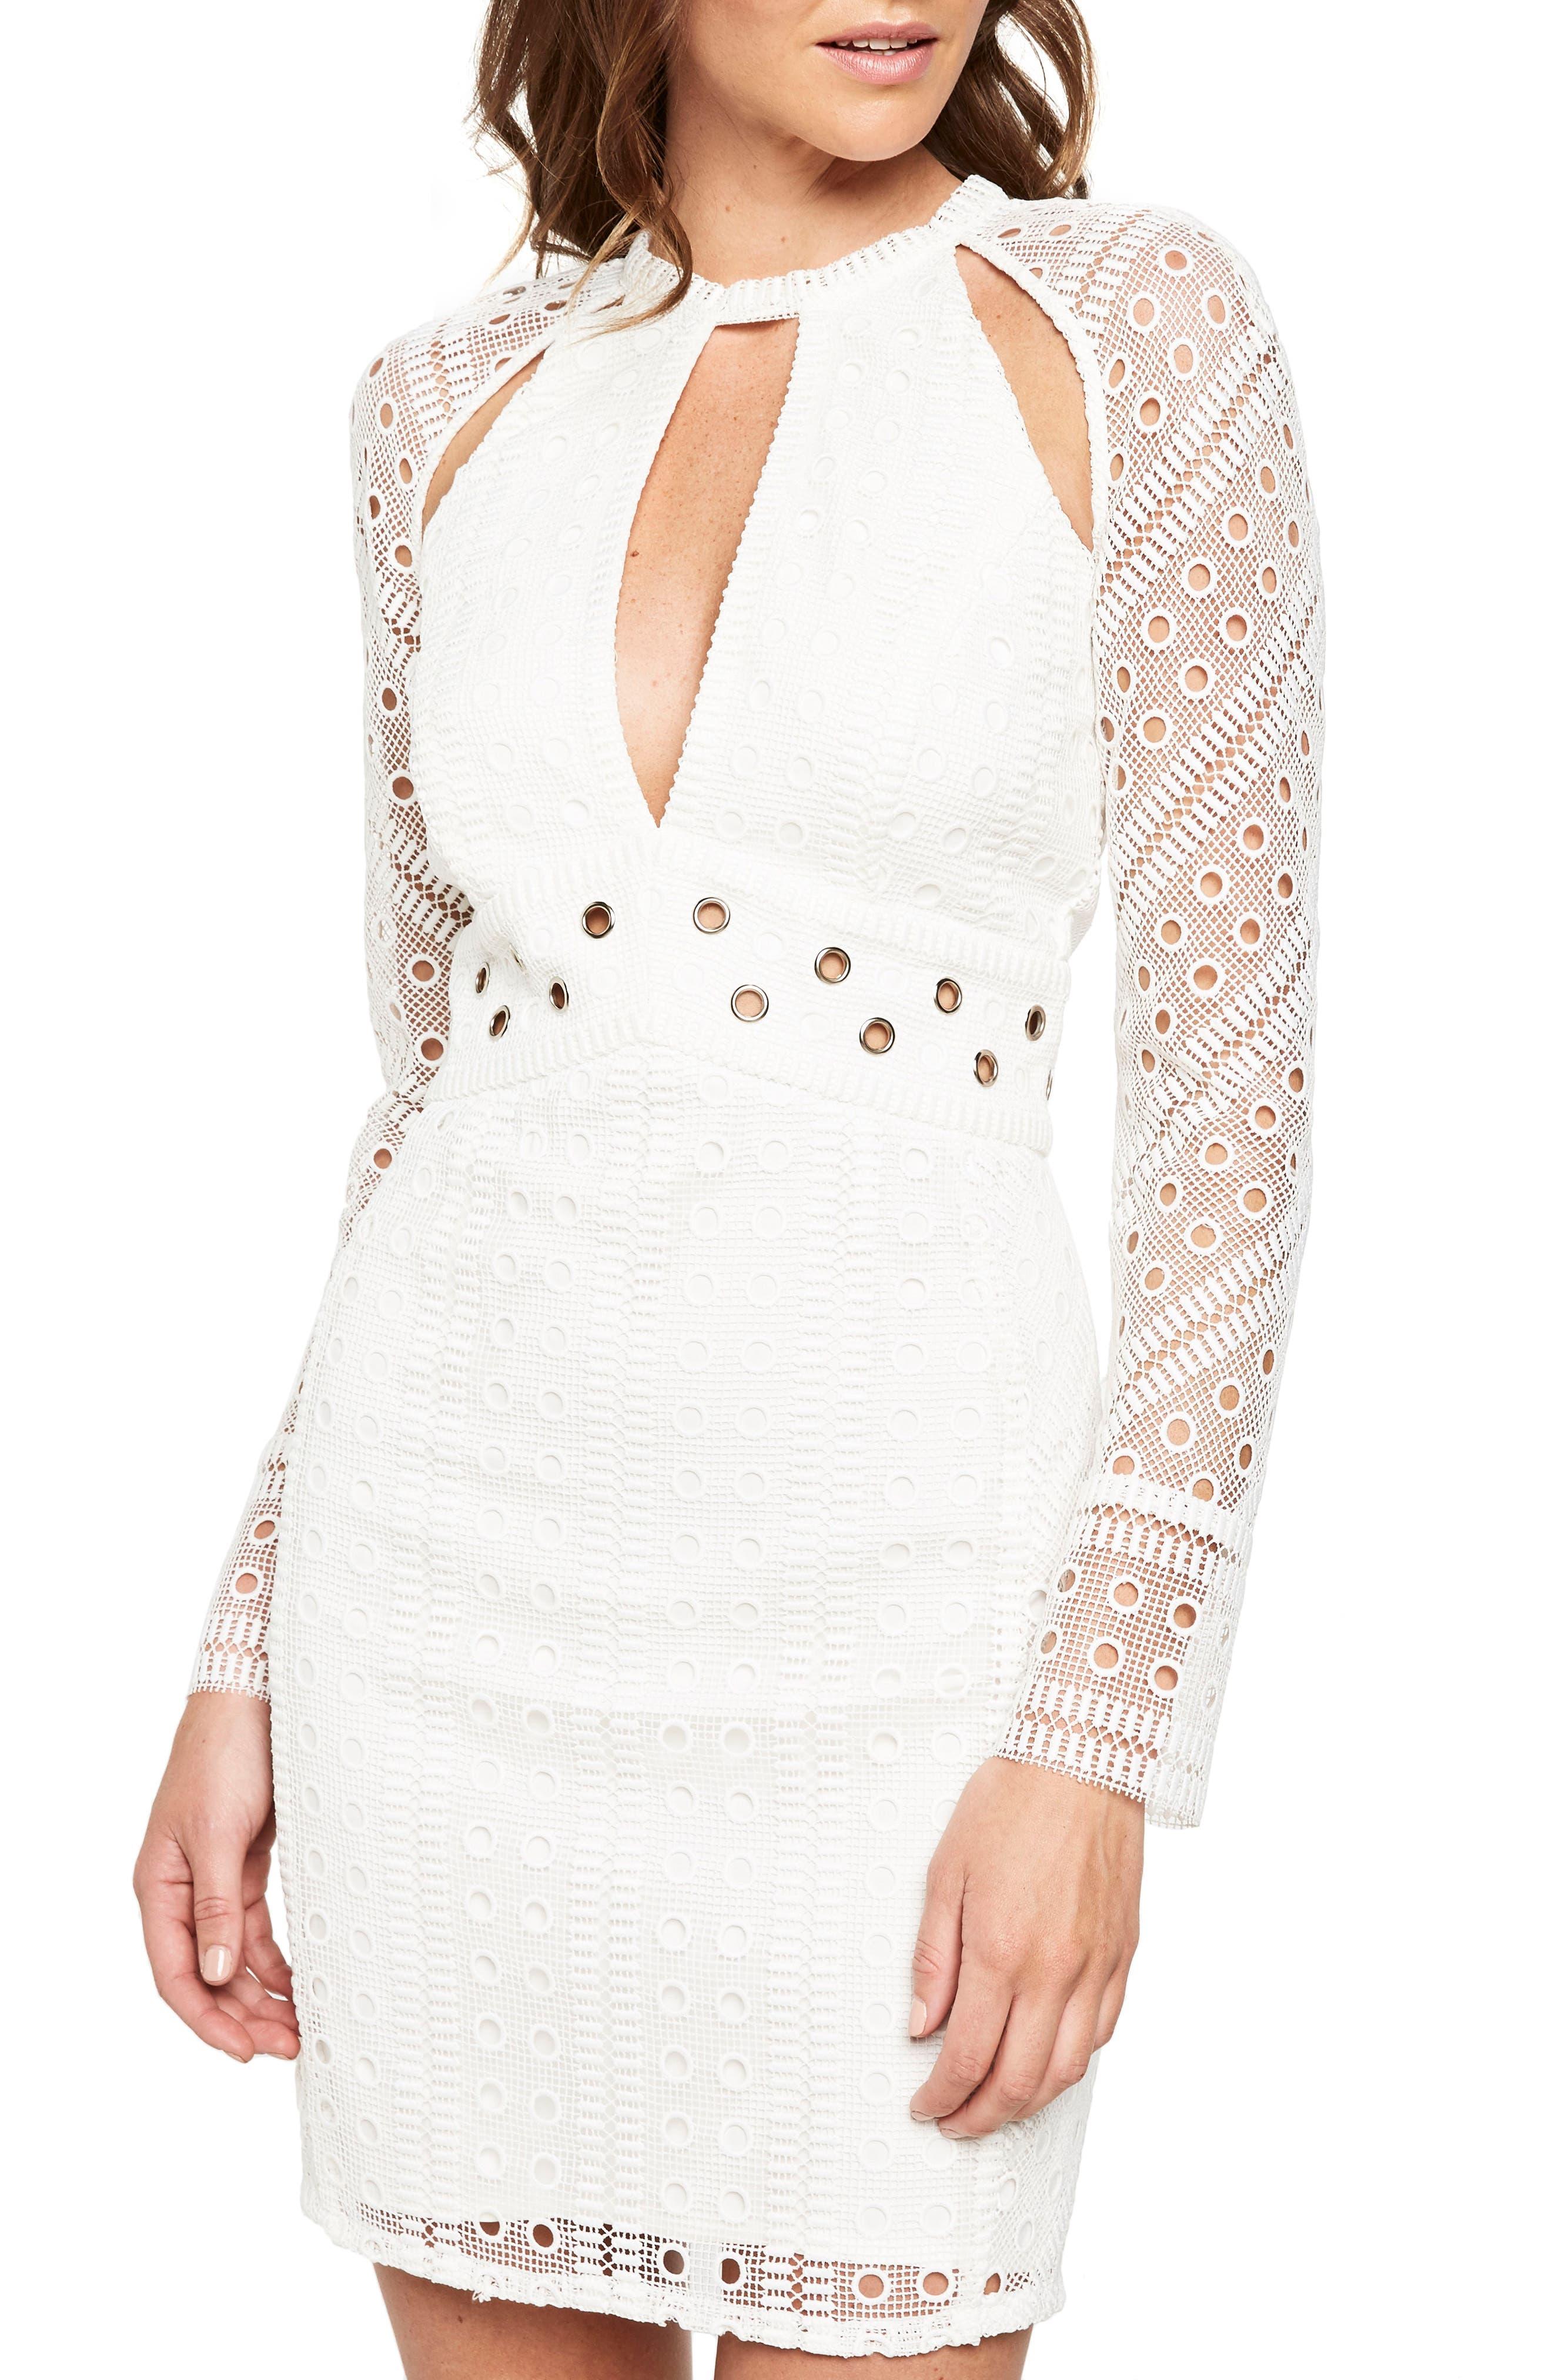 Main Image - Bardot Grommet Detail Broderie Anglaise Dress